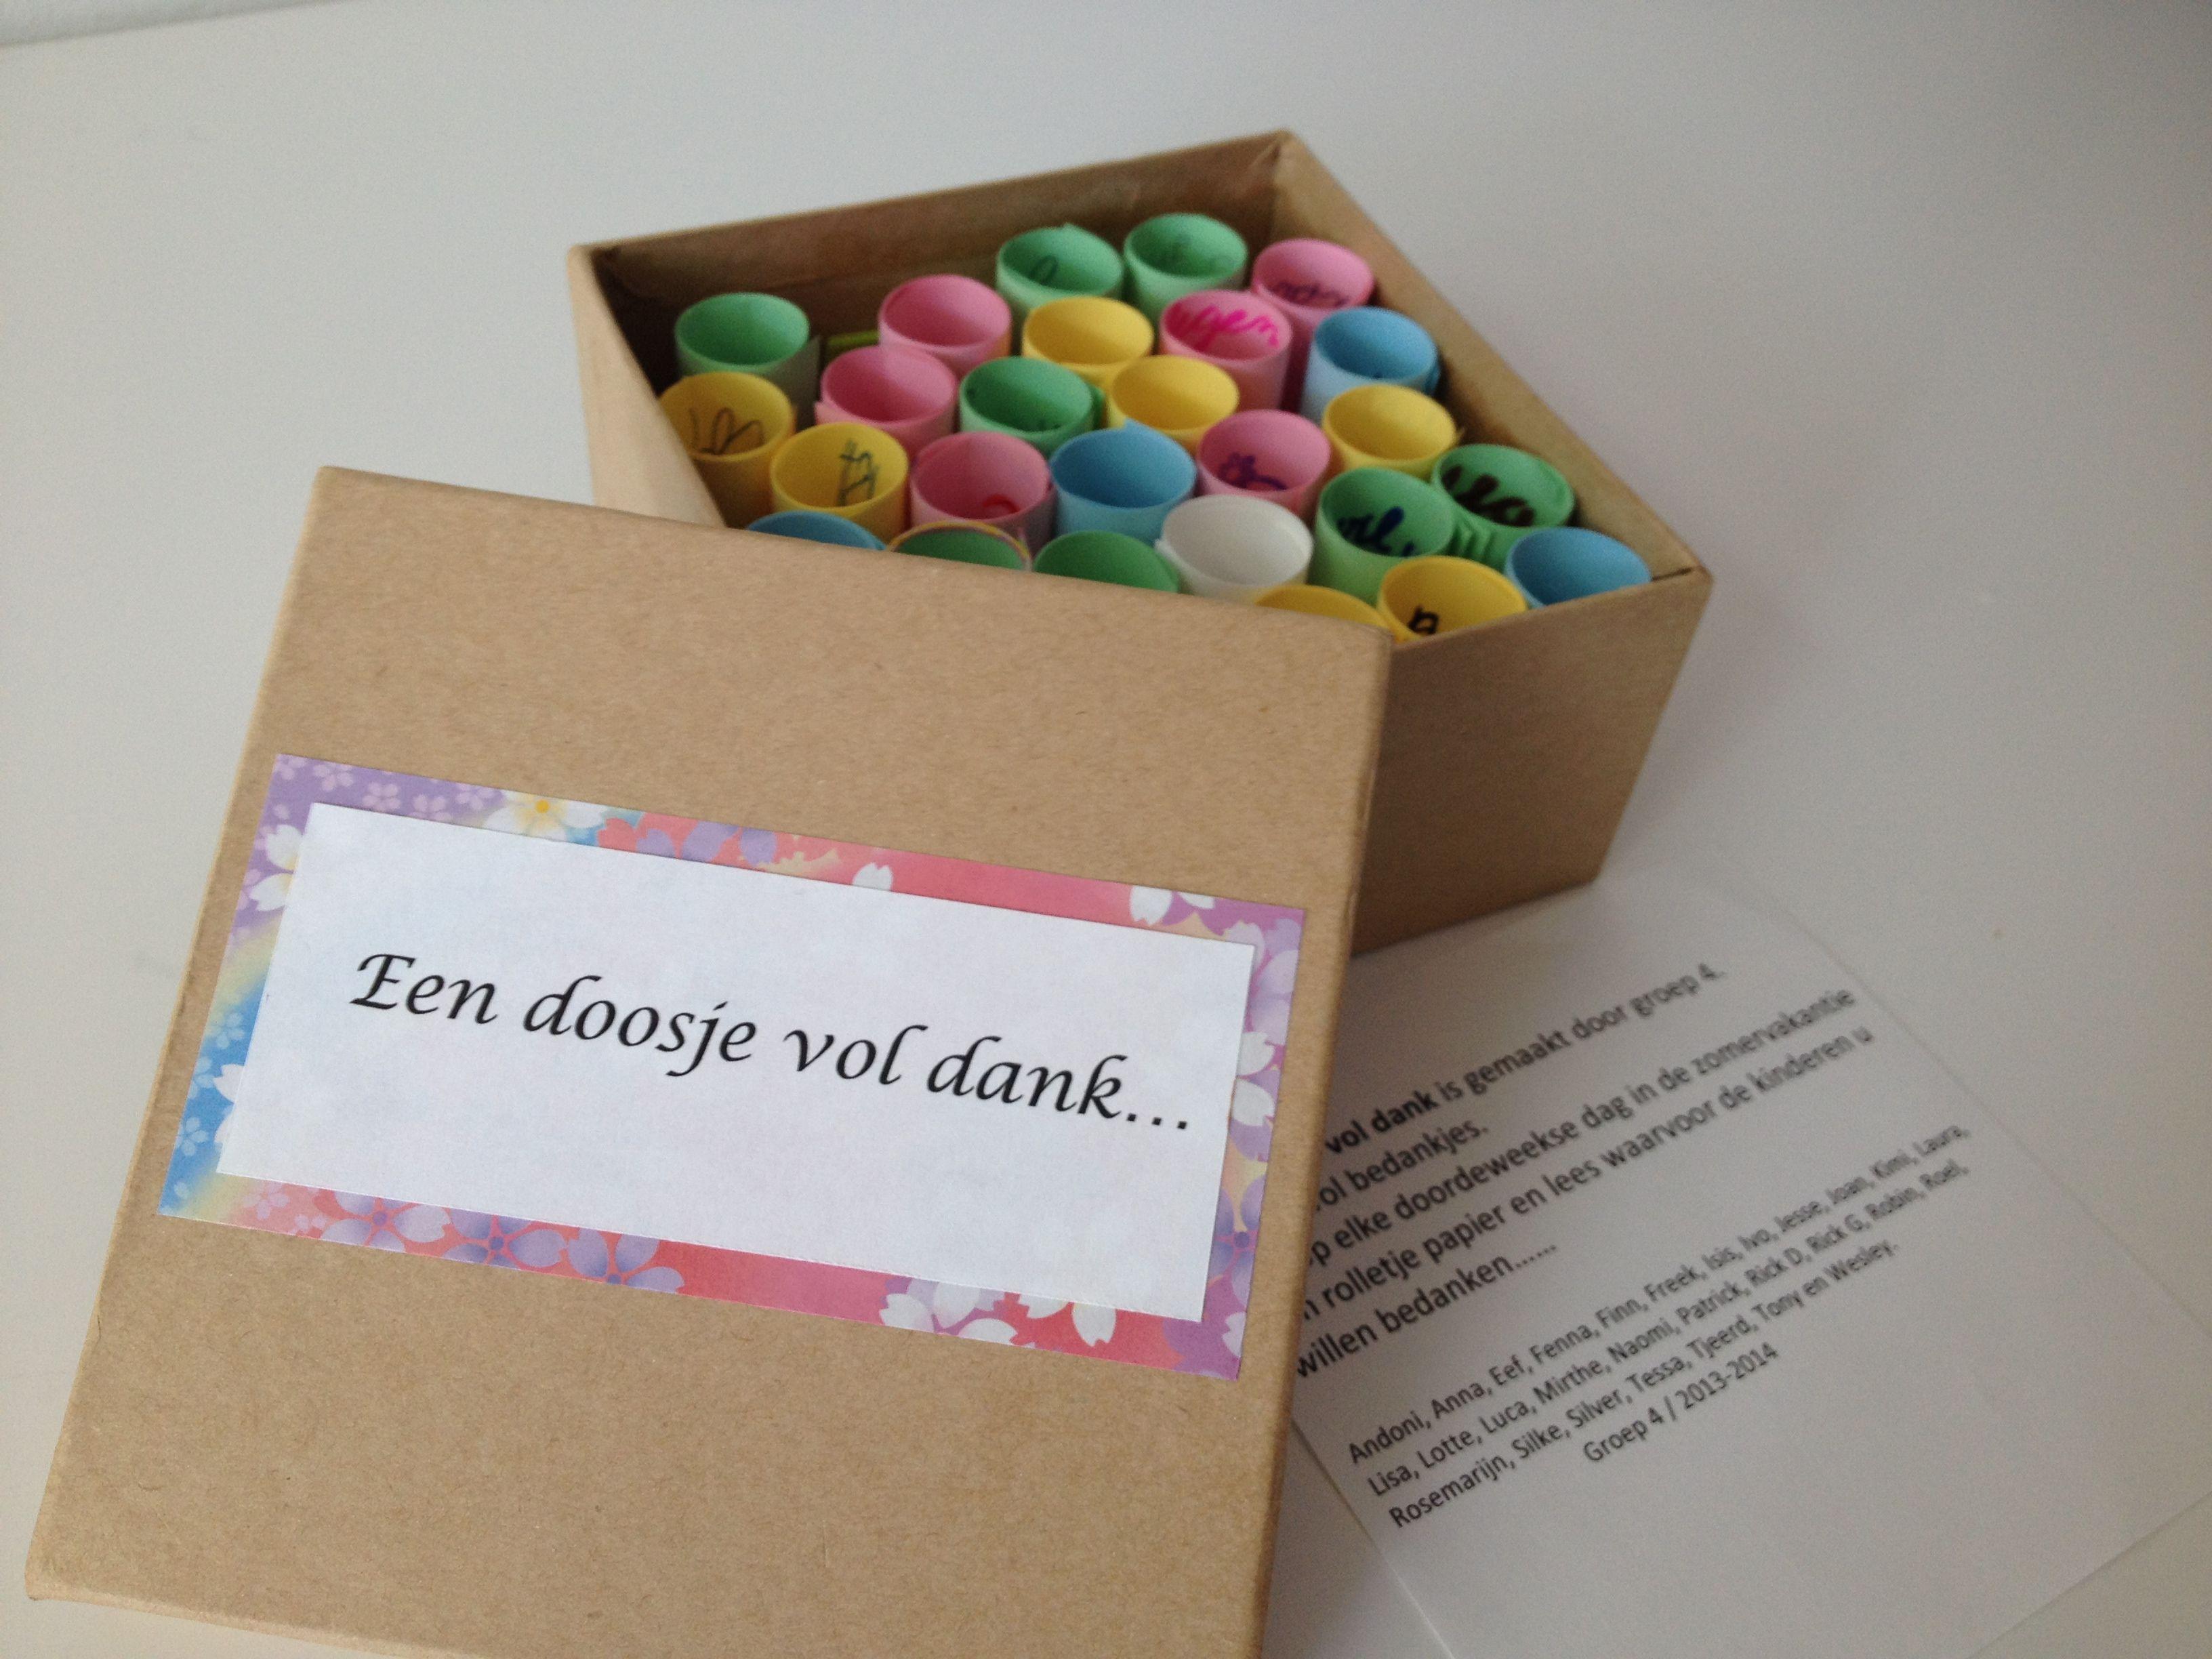 1000+ images about Traktatie, afscheid juf/meester on Pinterest ...